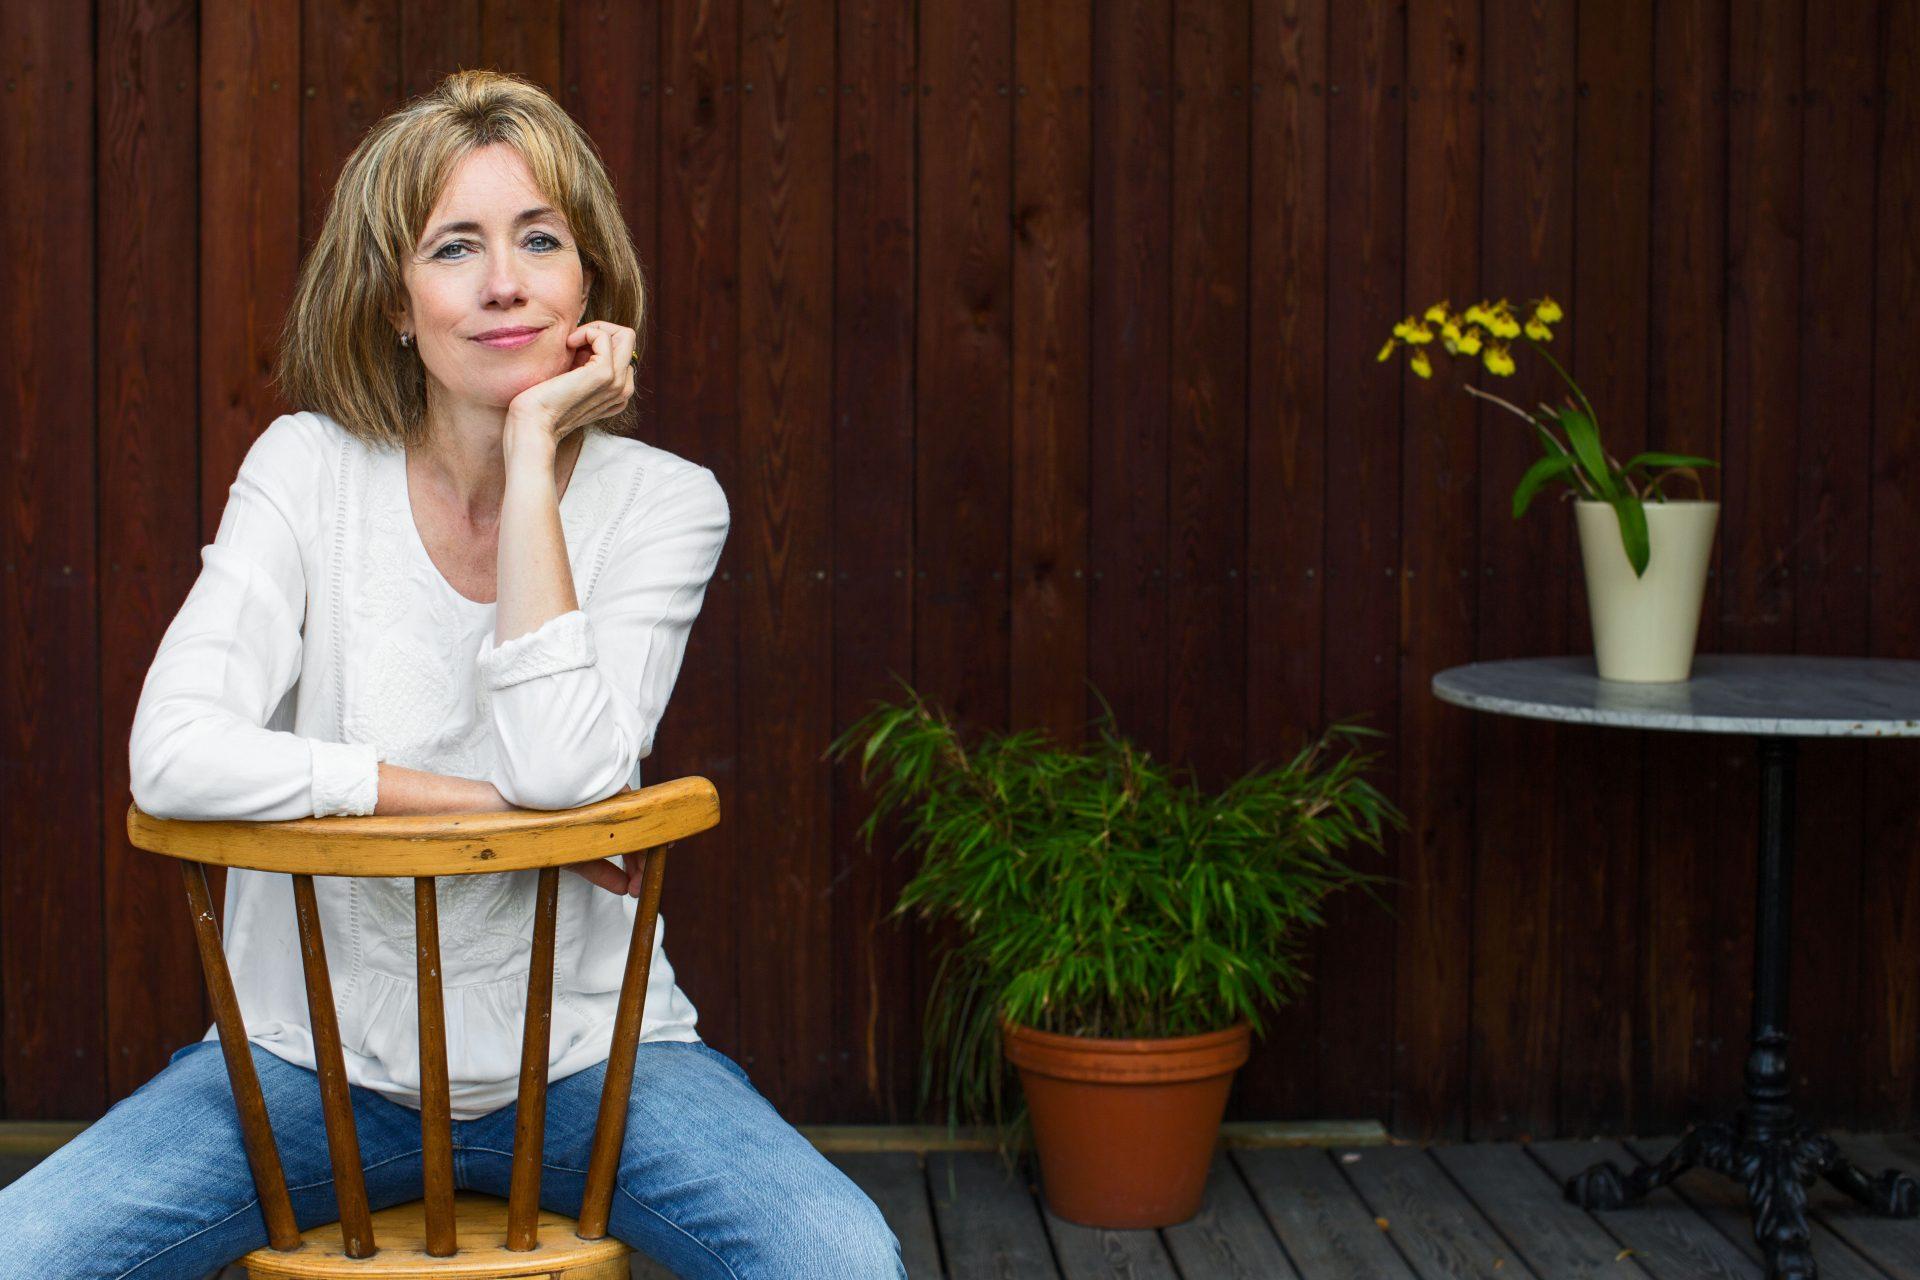 Charlotte Link, Schriftstellerin, writer, Berlin 9.9.2016 (Portraits)